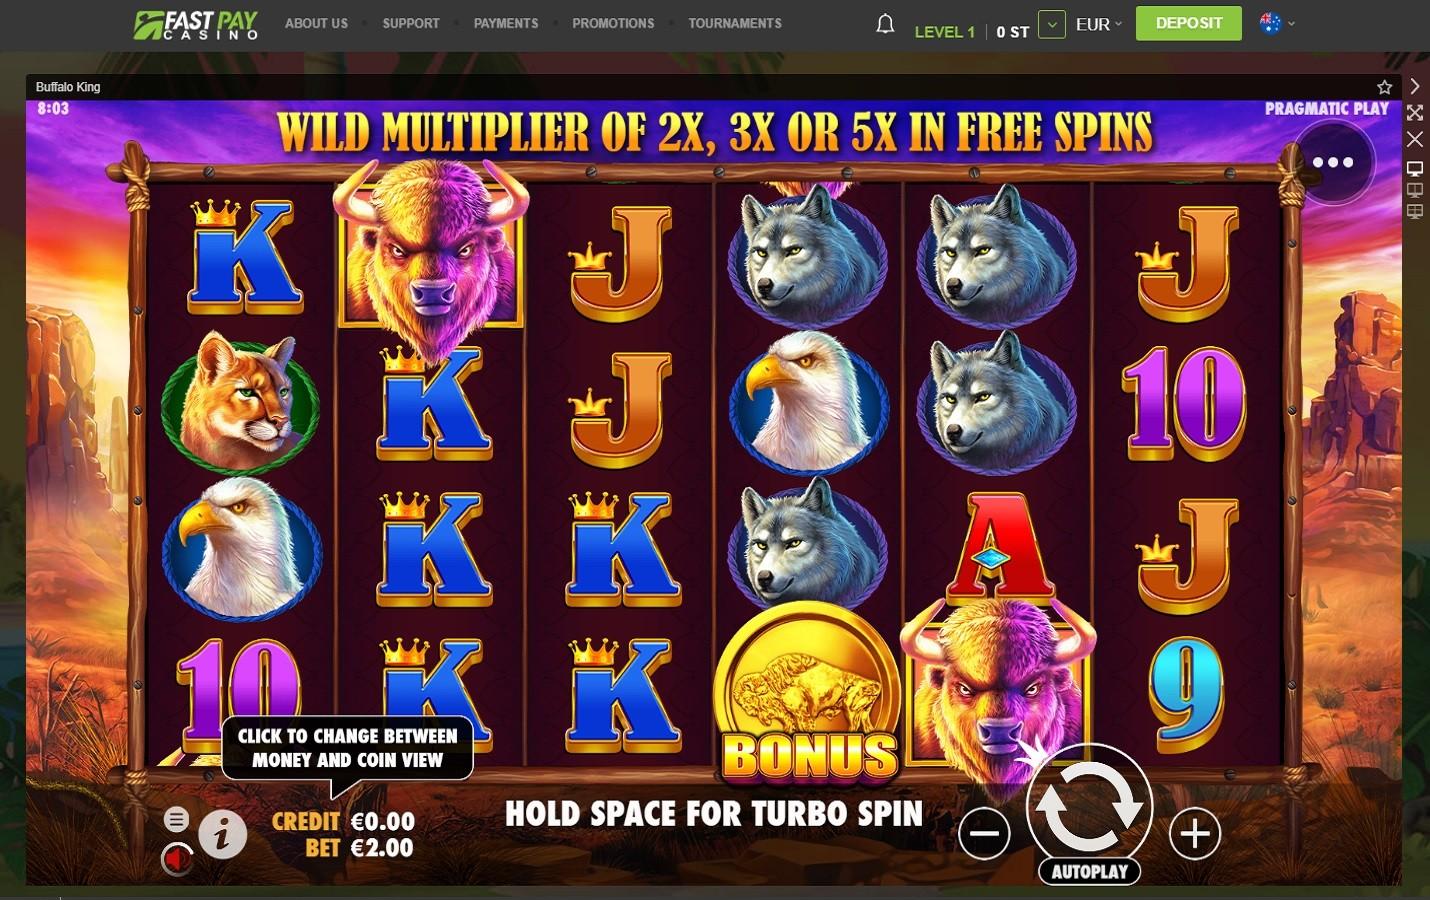 Fastpay_casino_pokie_hottop_casino